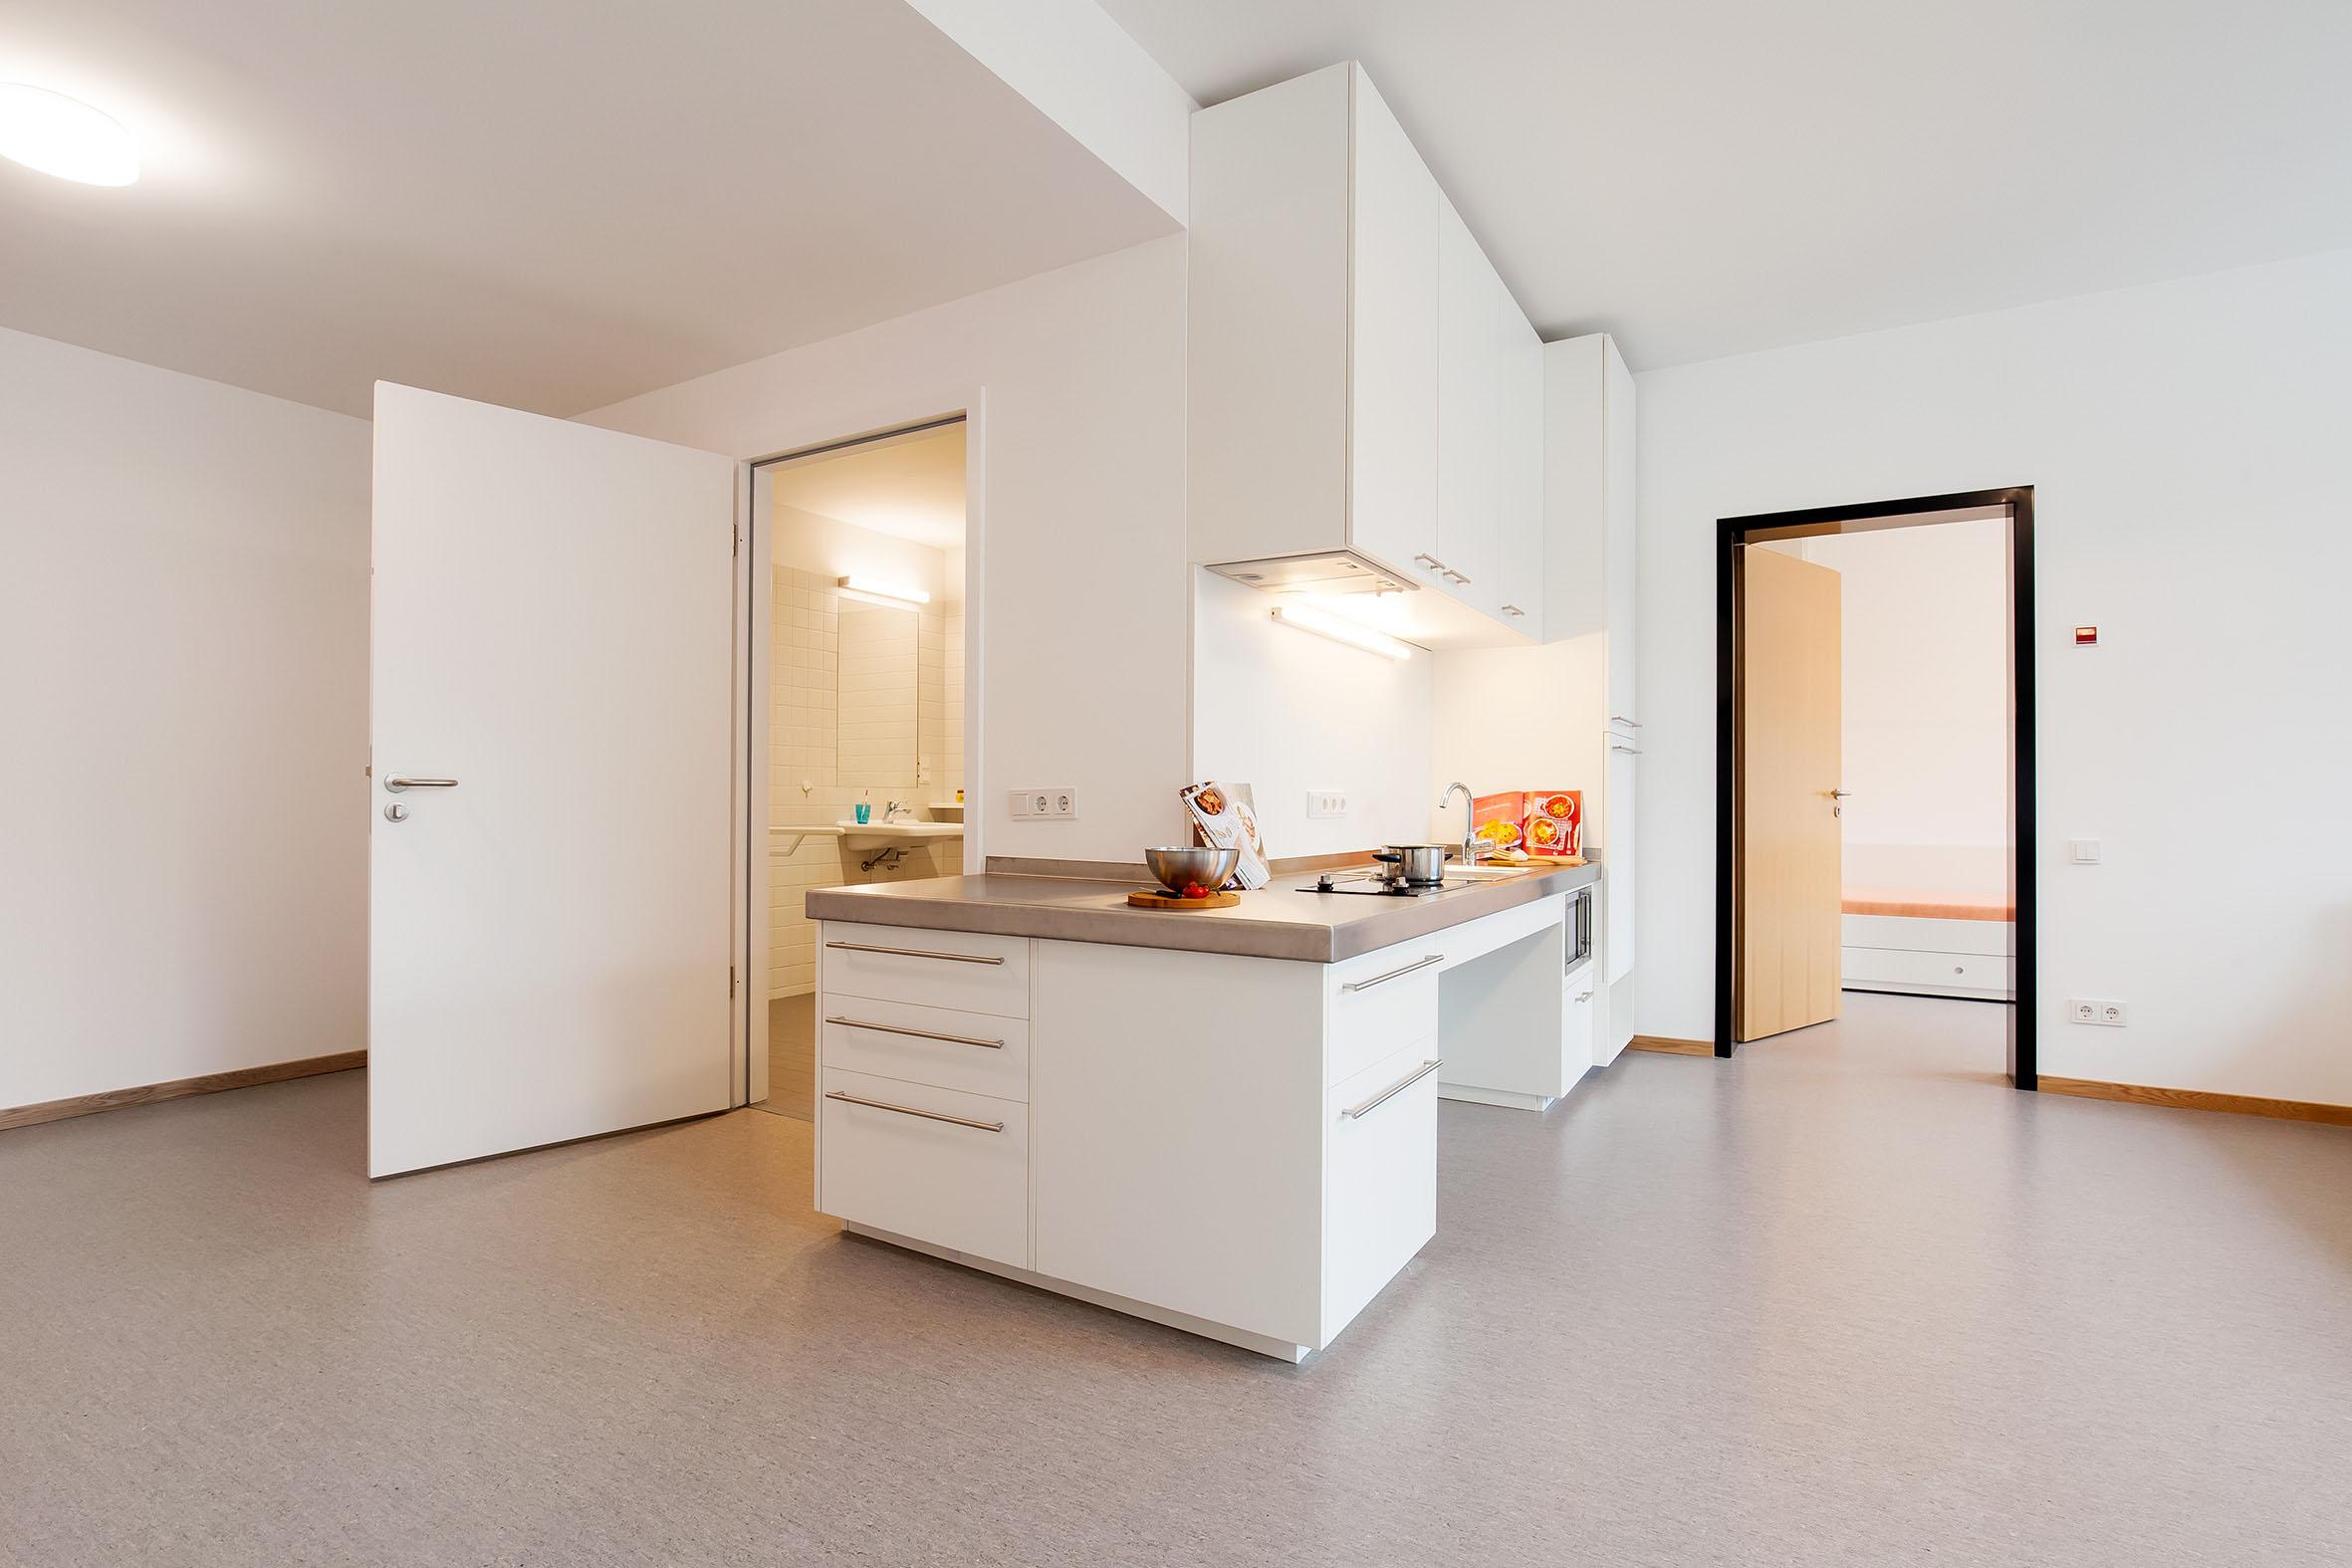 Rollstuhlfahrer-Apartment ready +